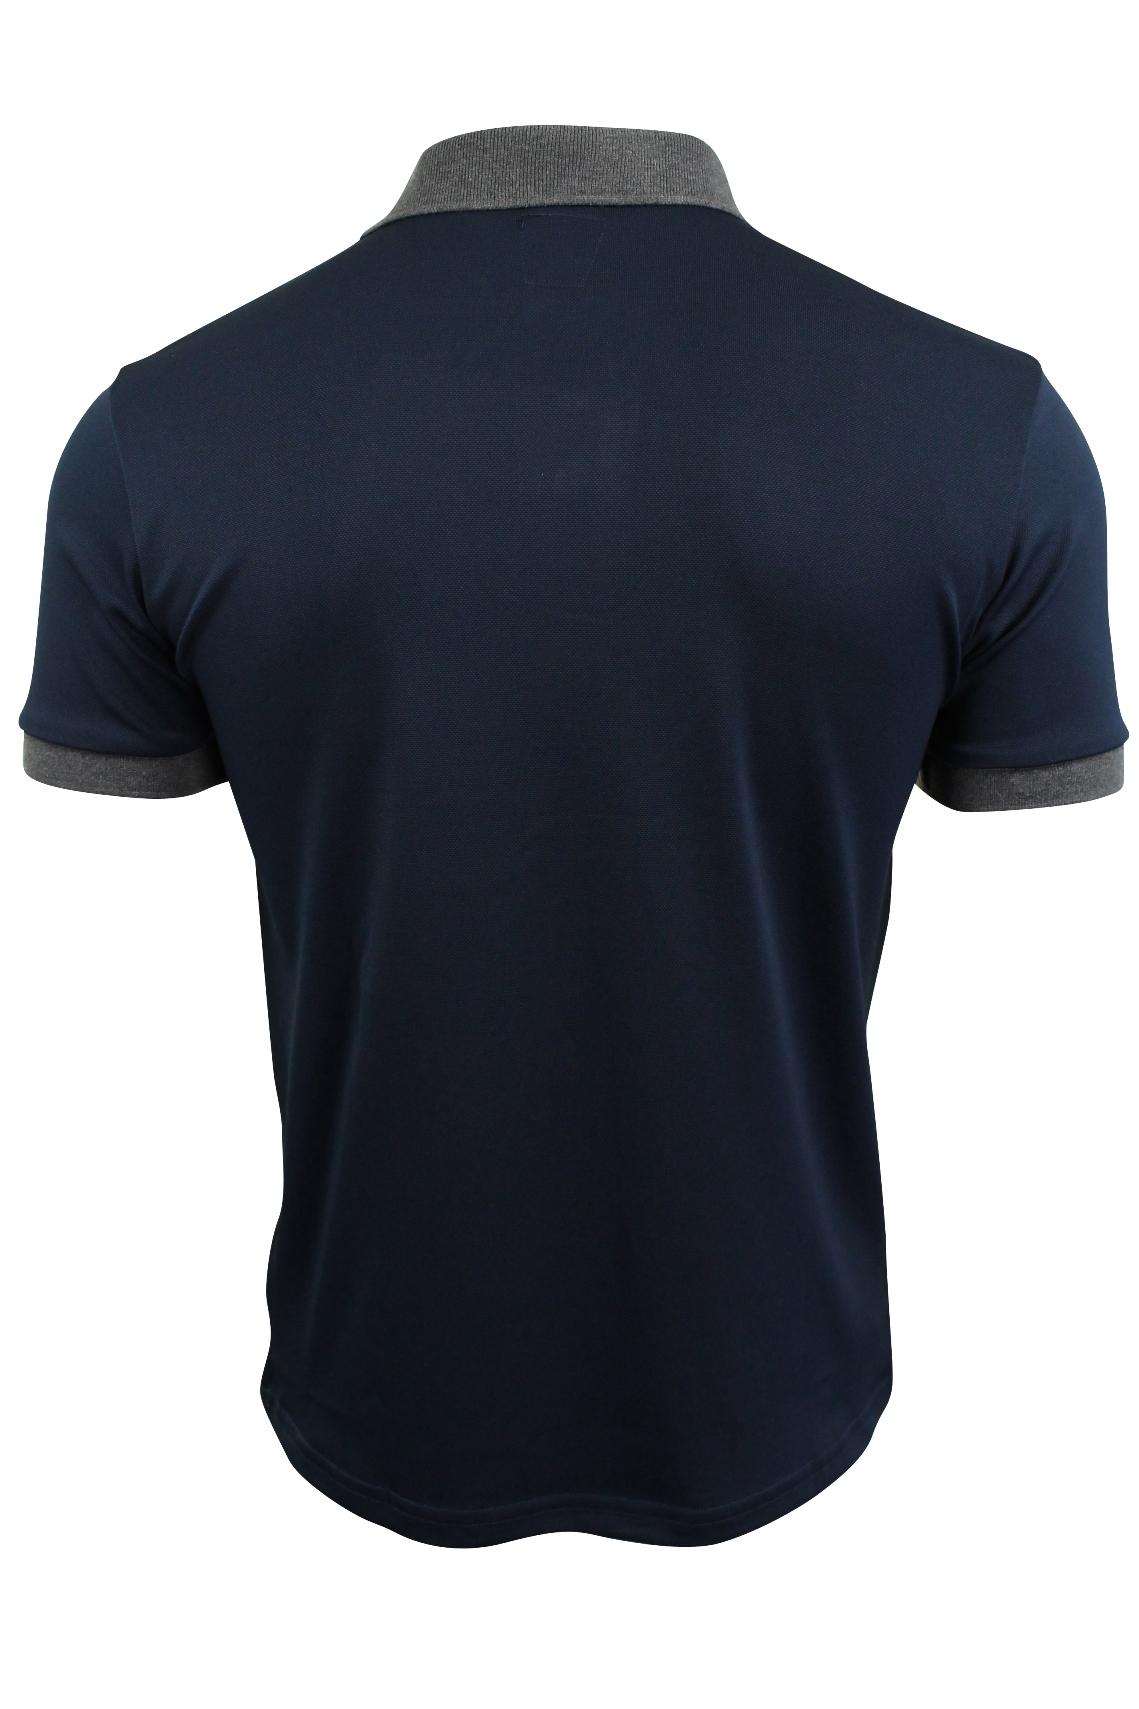 Mens-Polo-T-Shirt-by-D-Rock-Short-Sleeved thumbnail 8